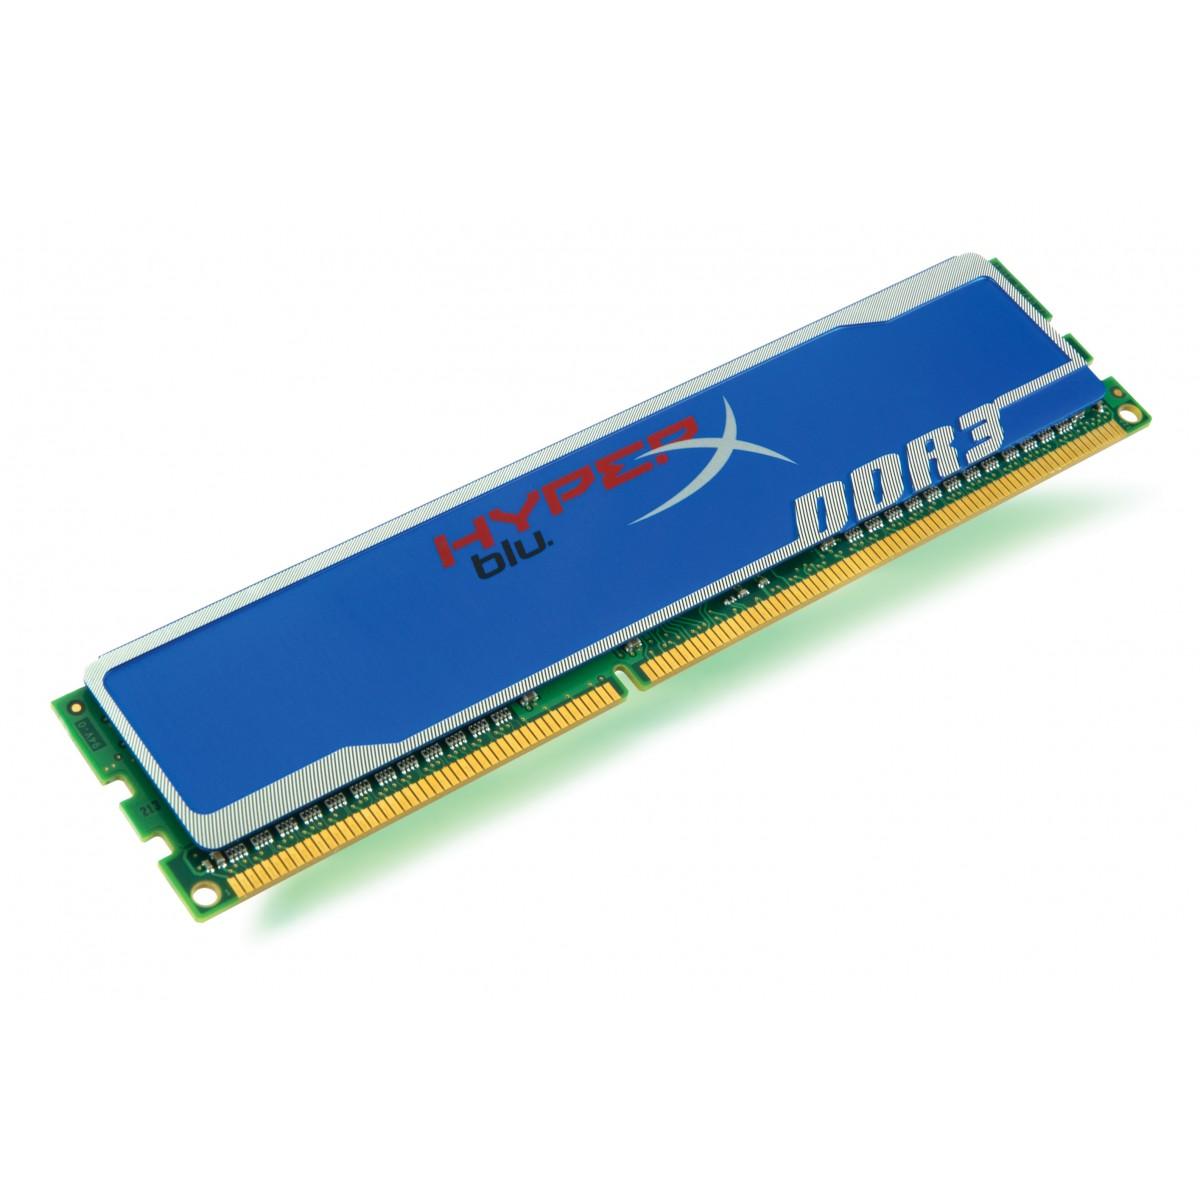 Memória Kingston Hyper X 8GB 1600 Mhz DDR3 - KHX1600C10D3B1/8G  - ShopNoroeste.com.br